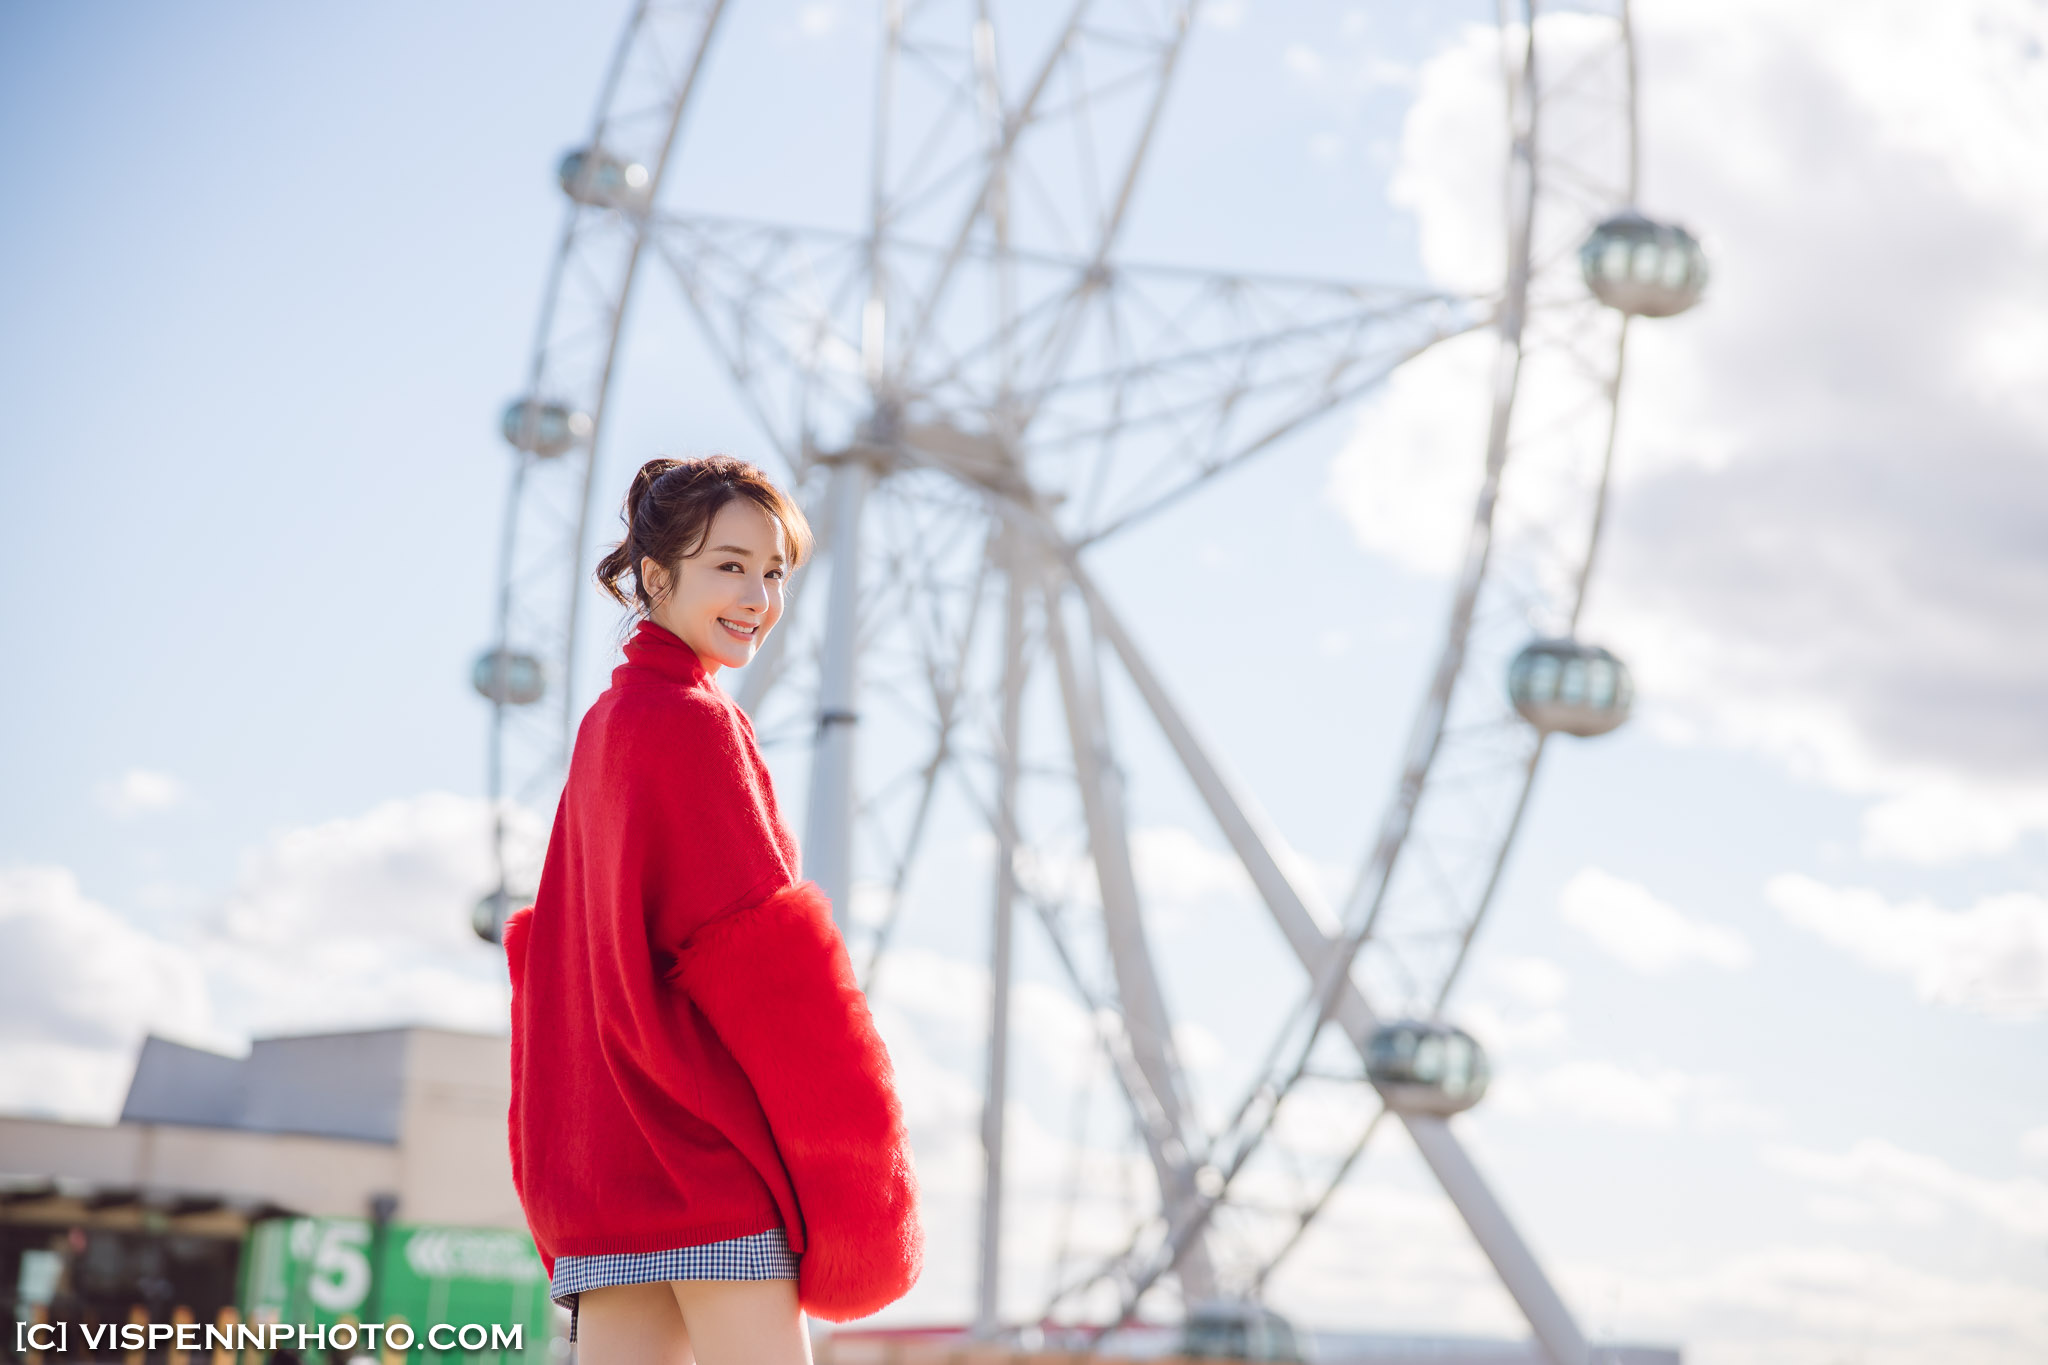 Melbourne Fashion Portrait Commercial Photography VISPENN 墨尔本 服装 商业 人像 摄影 LiYiXiao 1P 0384 EOSR VISPENN